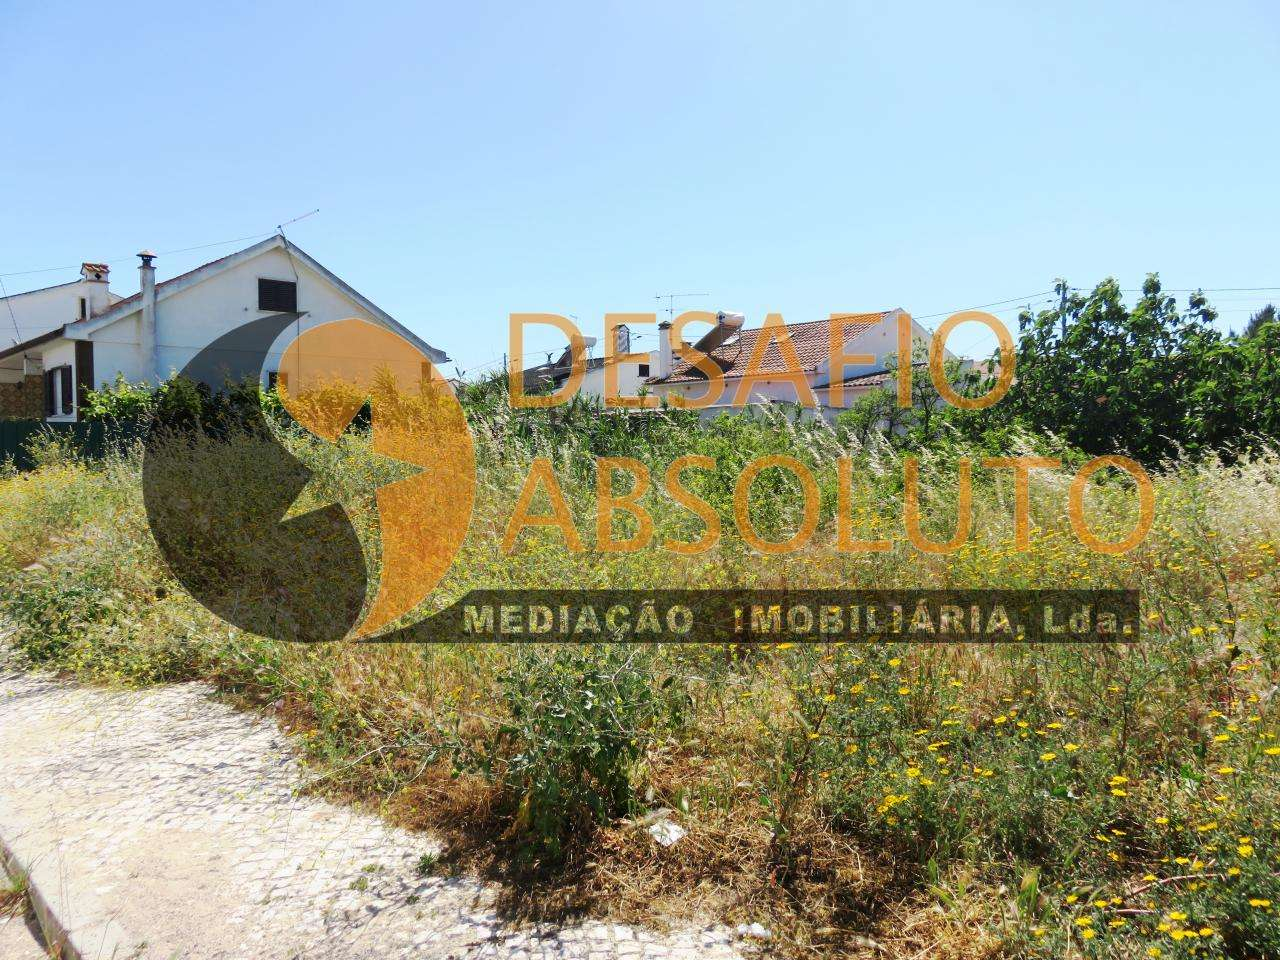 Terreno para comprar, Quinta do Conde, Sesimbra, Setúbal - Foto 2